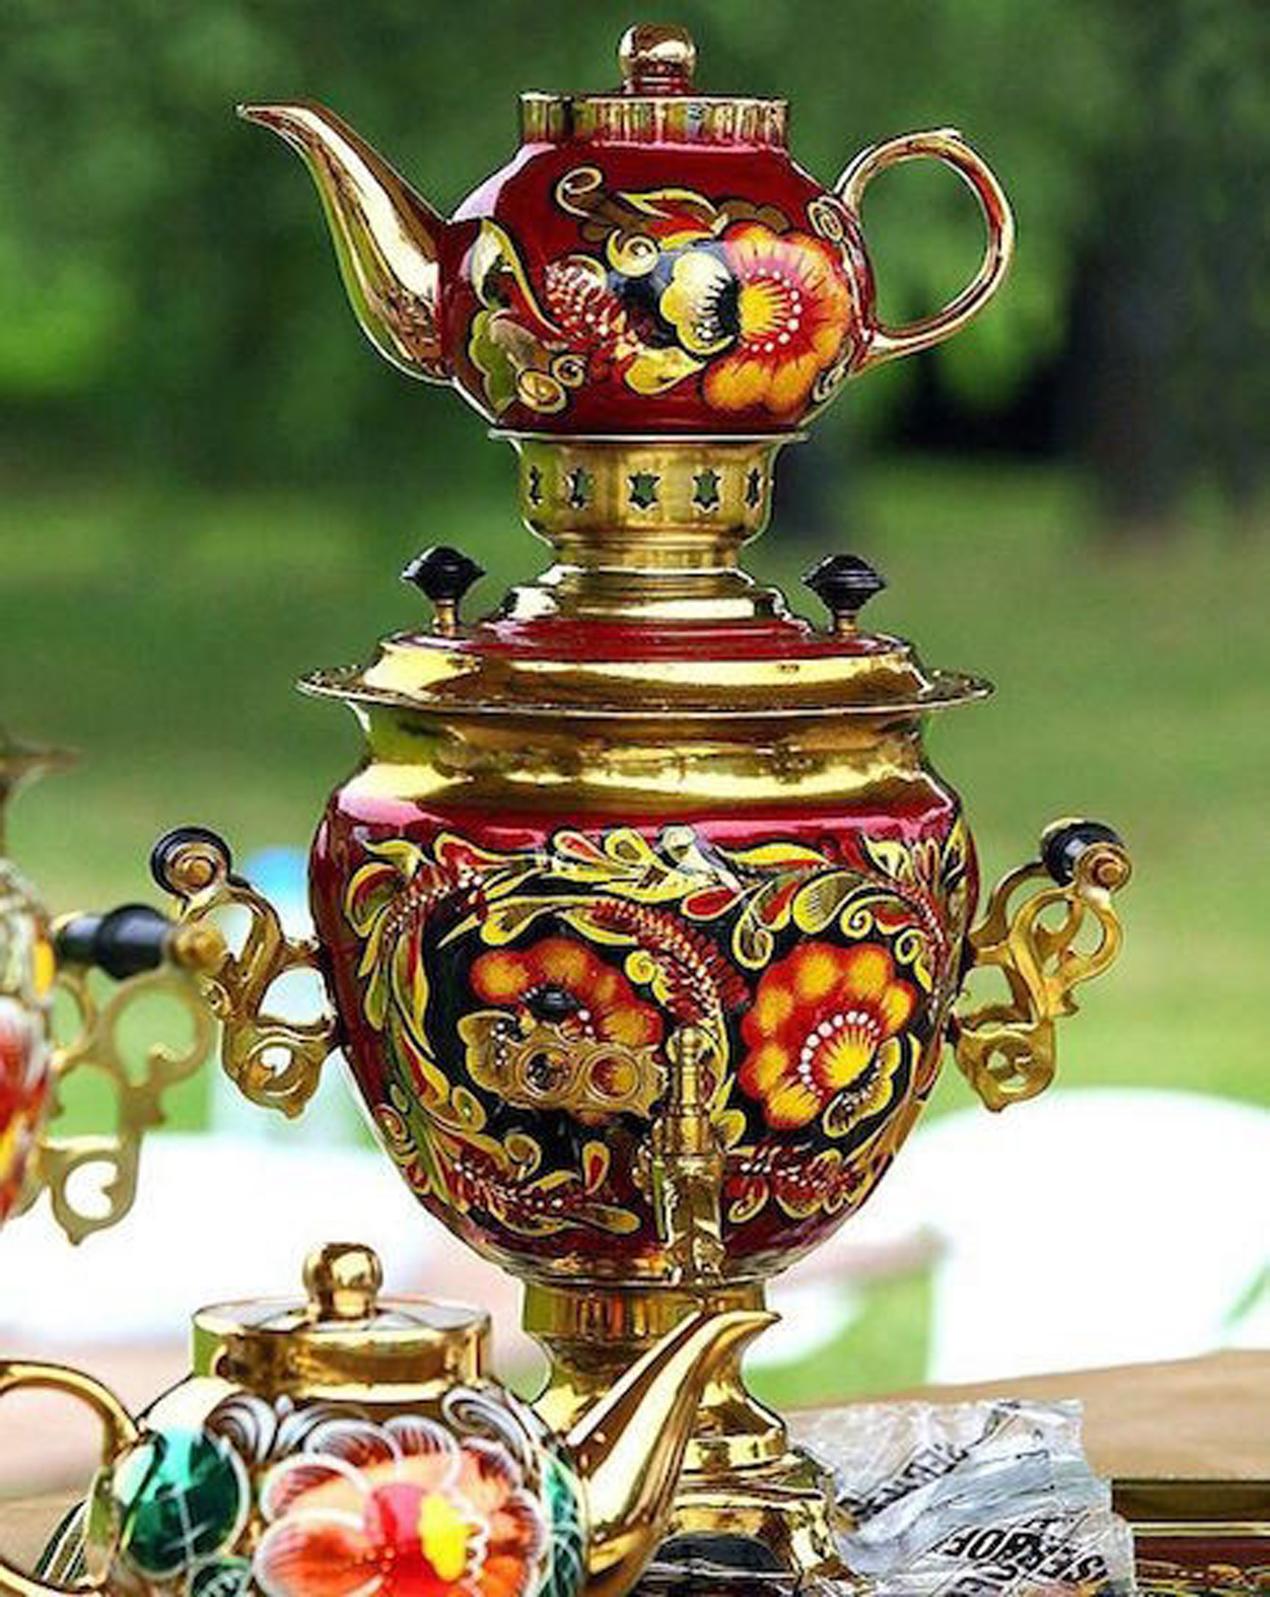 Le Samovar russe, 300 ans de tradition - Russia Beyond FR